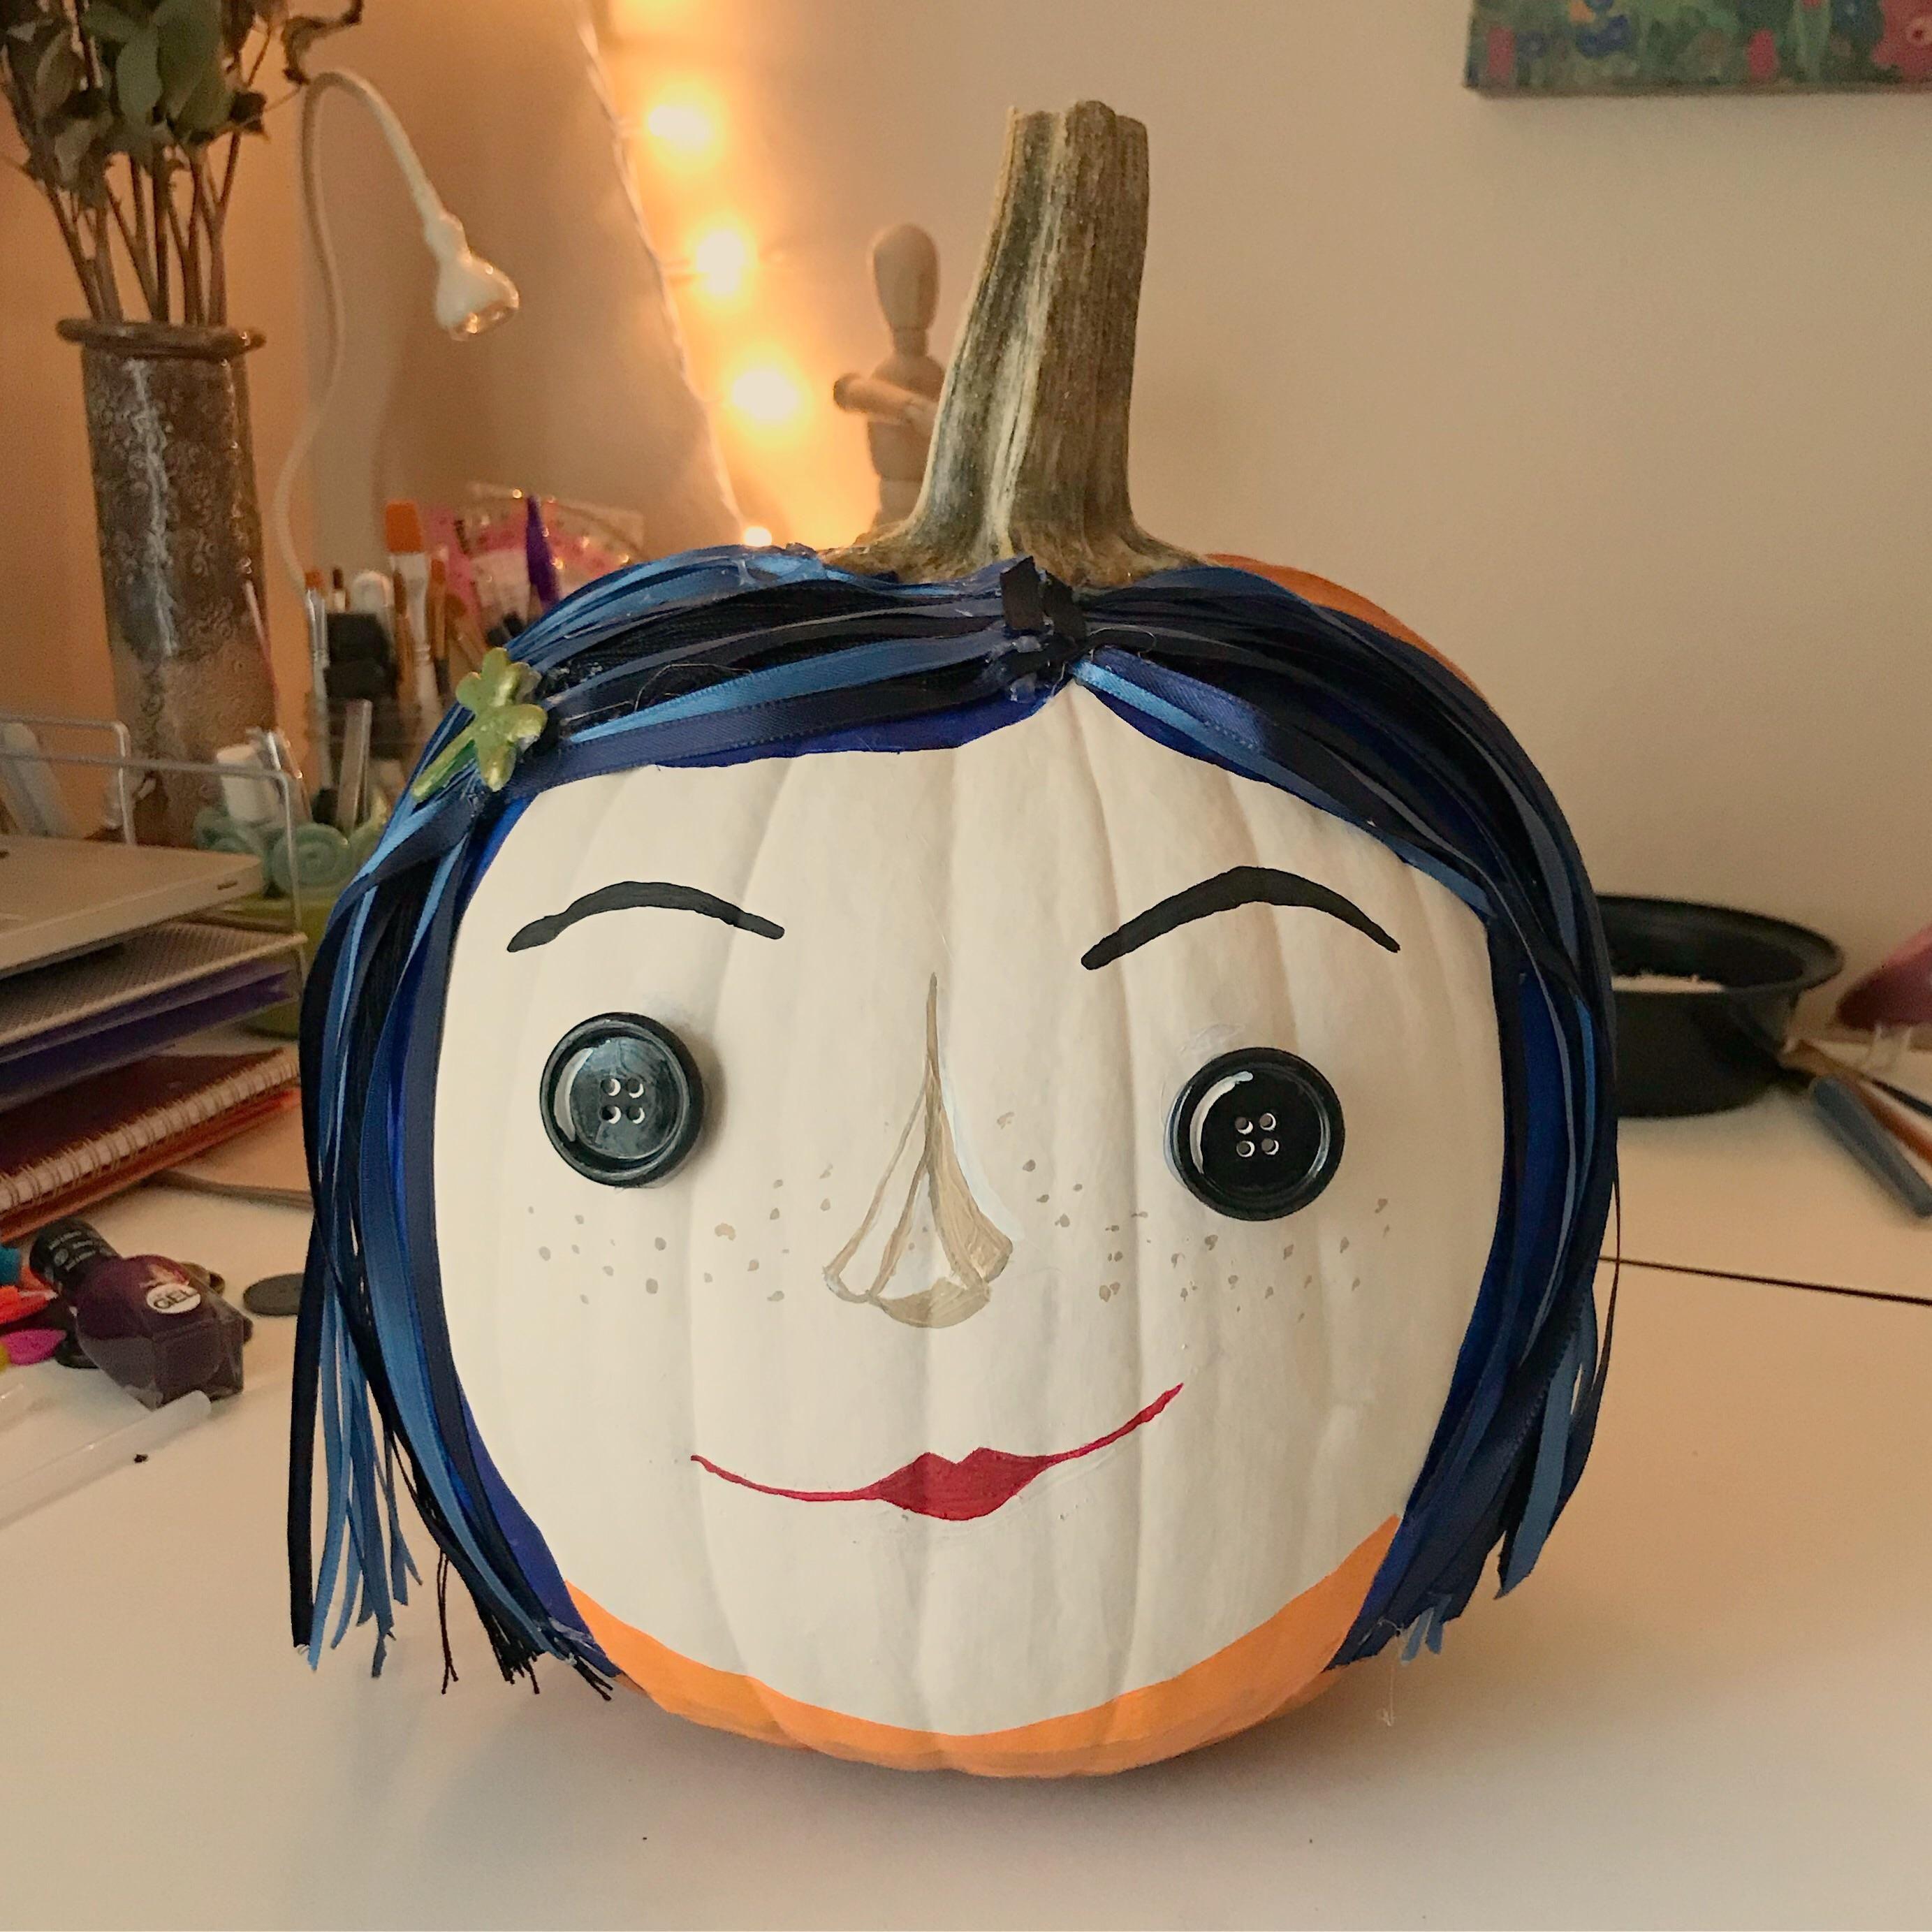 Coraline No Carve Pumpkin Diyhalloween In 2020 Pumpkin Halloween Decorations Halloween Painting Fall Halloween Decor